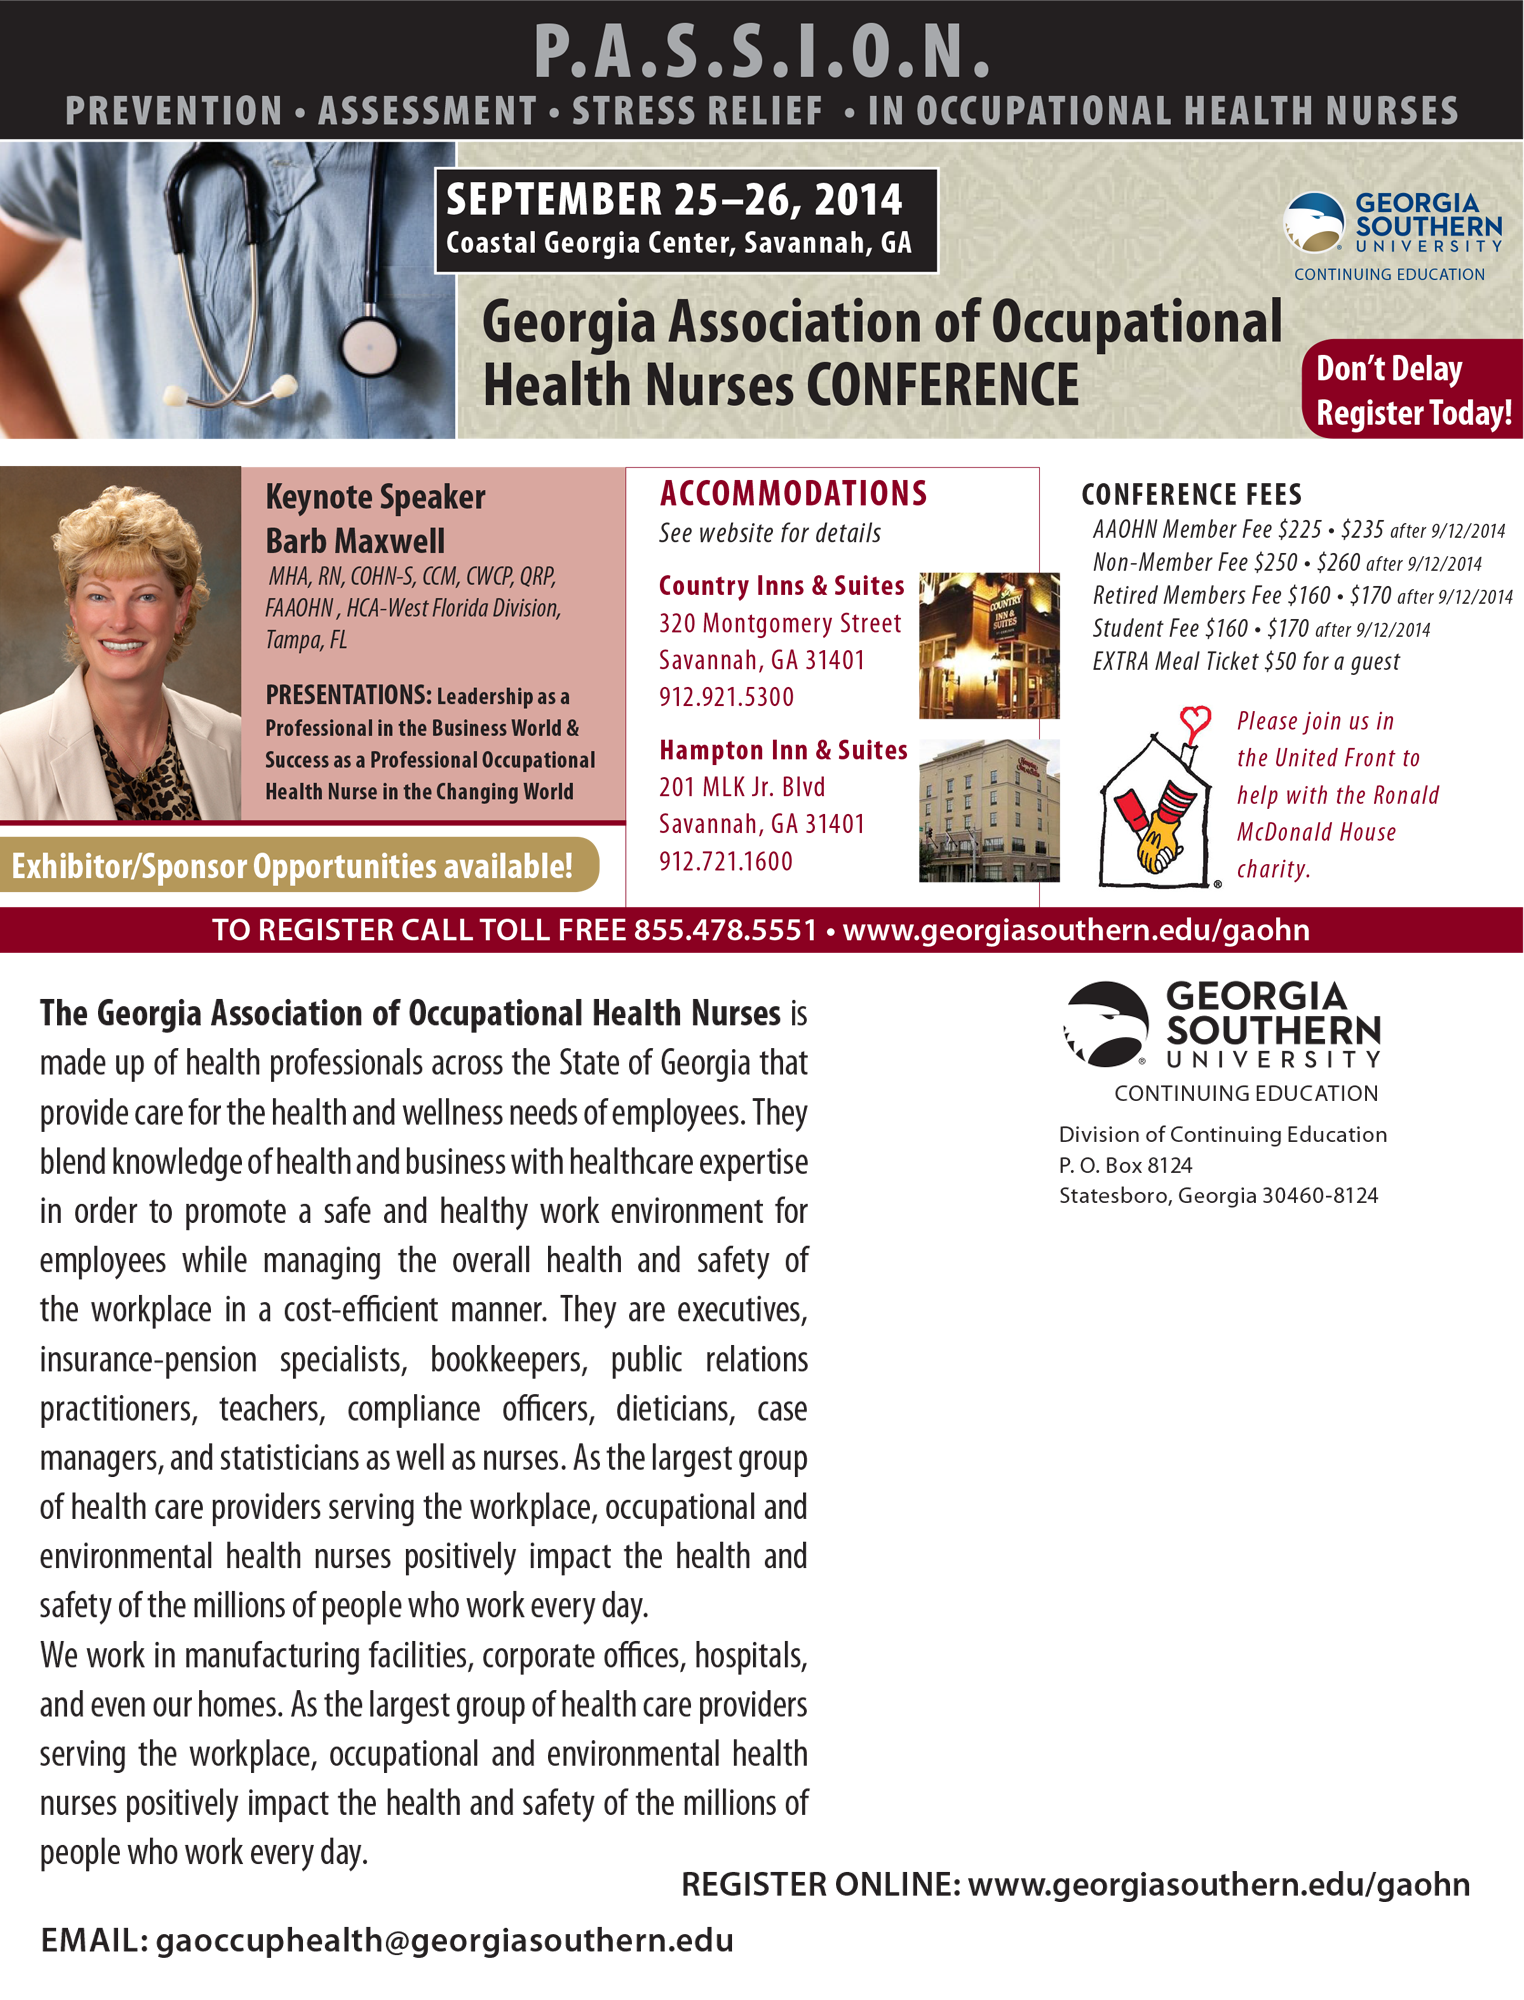 Georgia Association of Occupational Health Nurses Conference